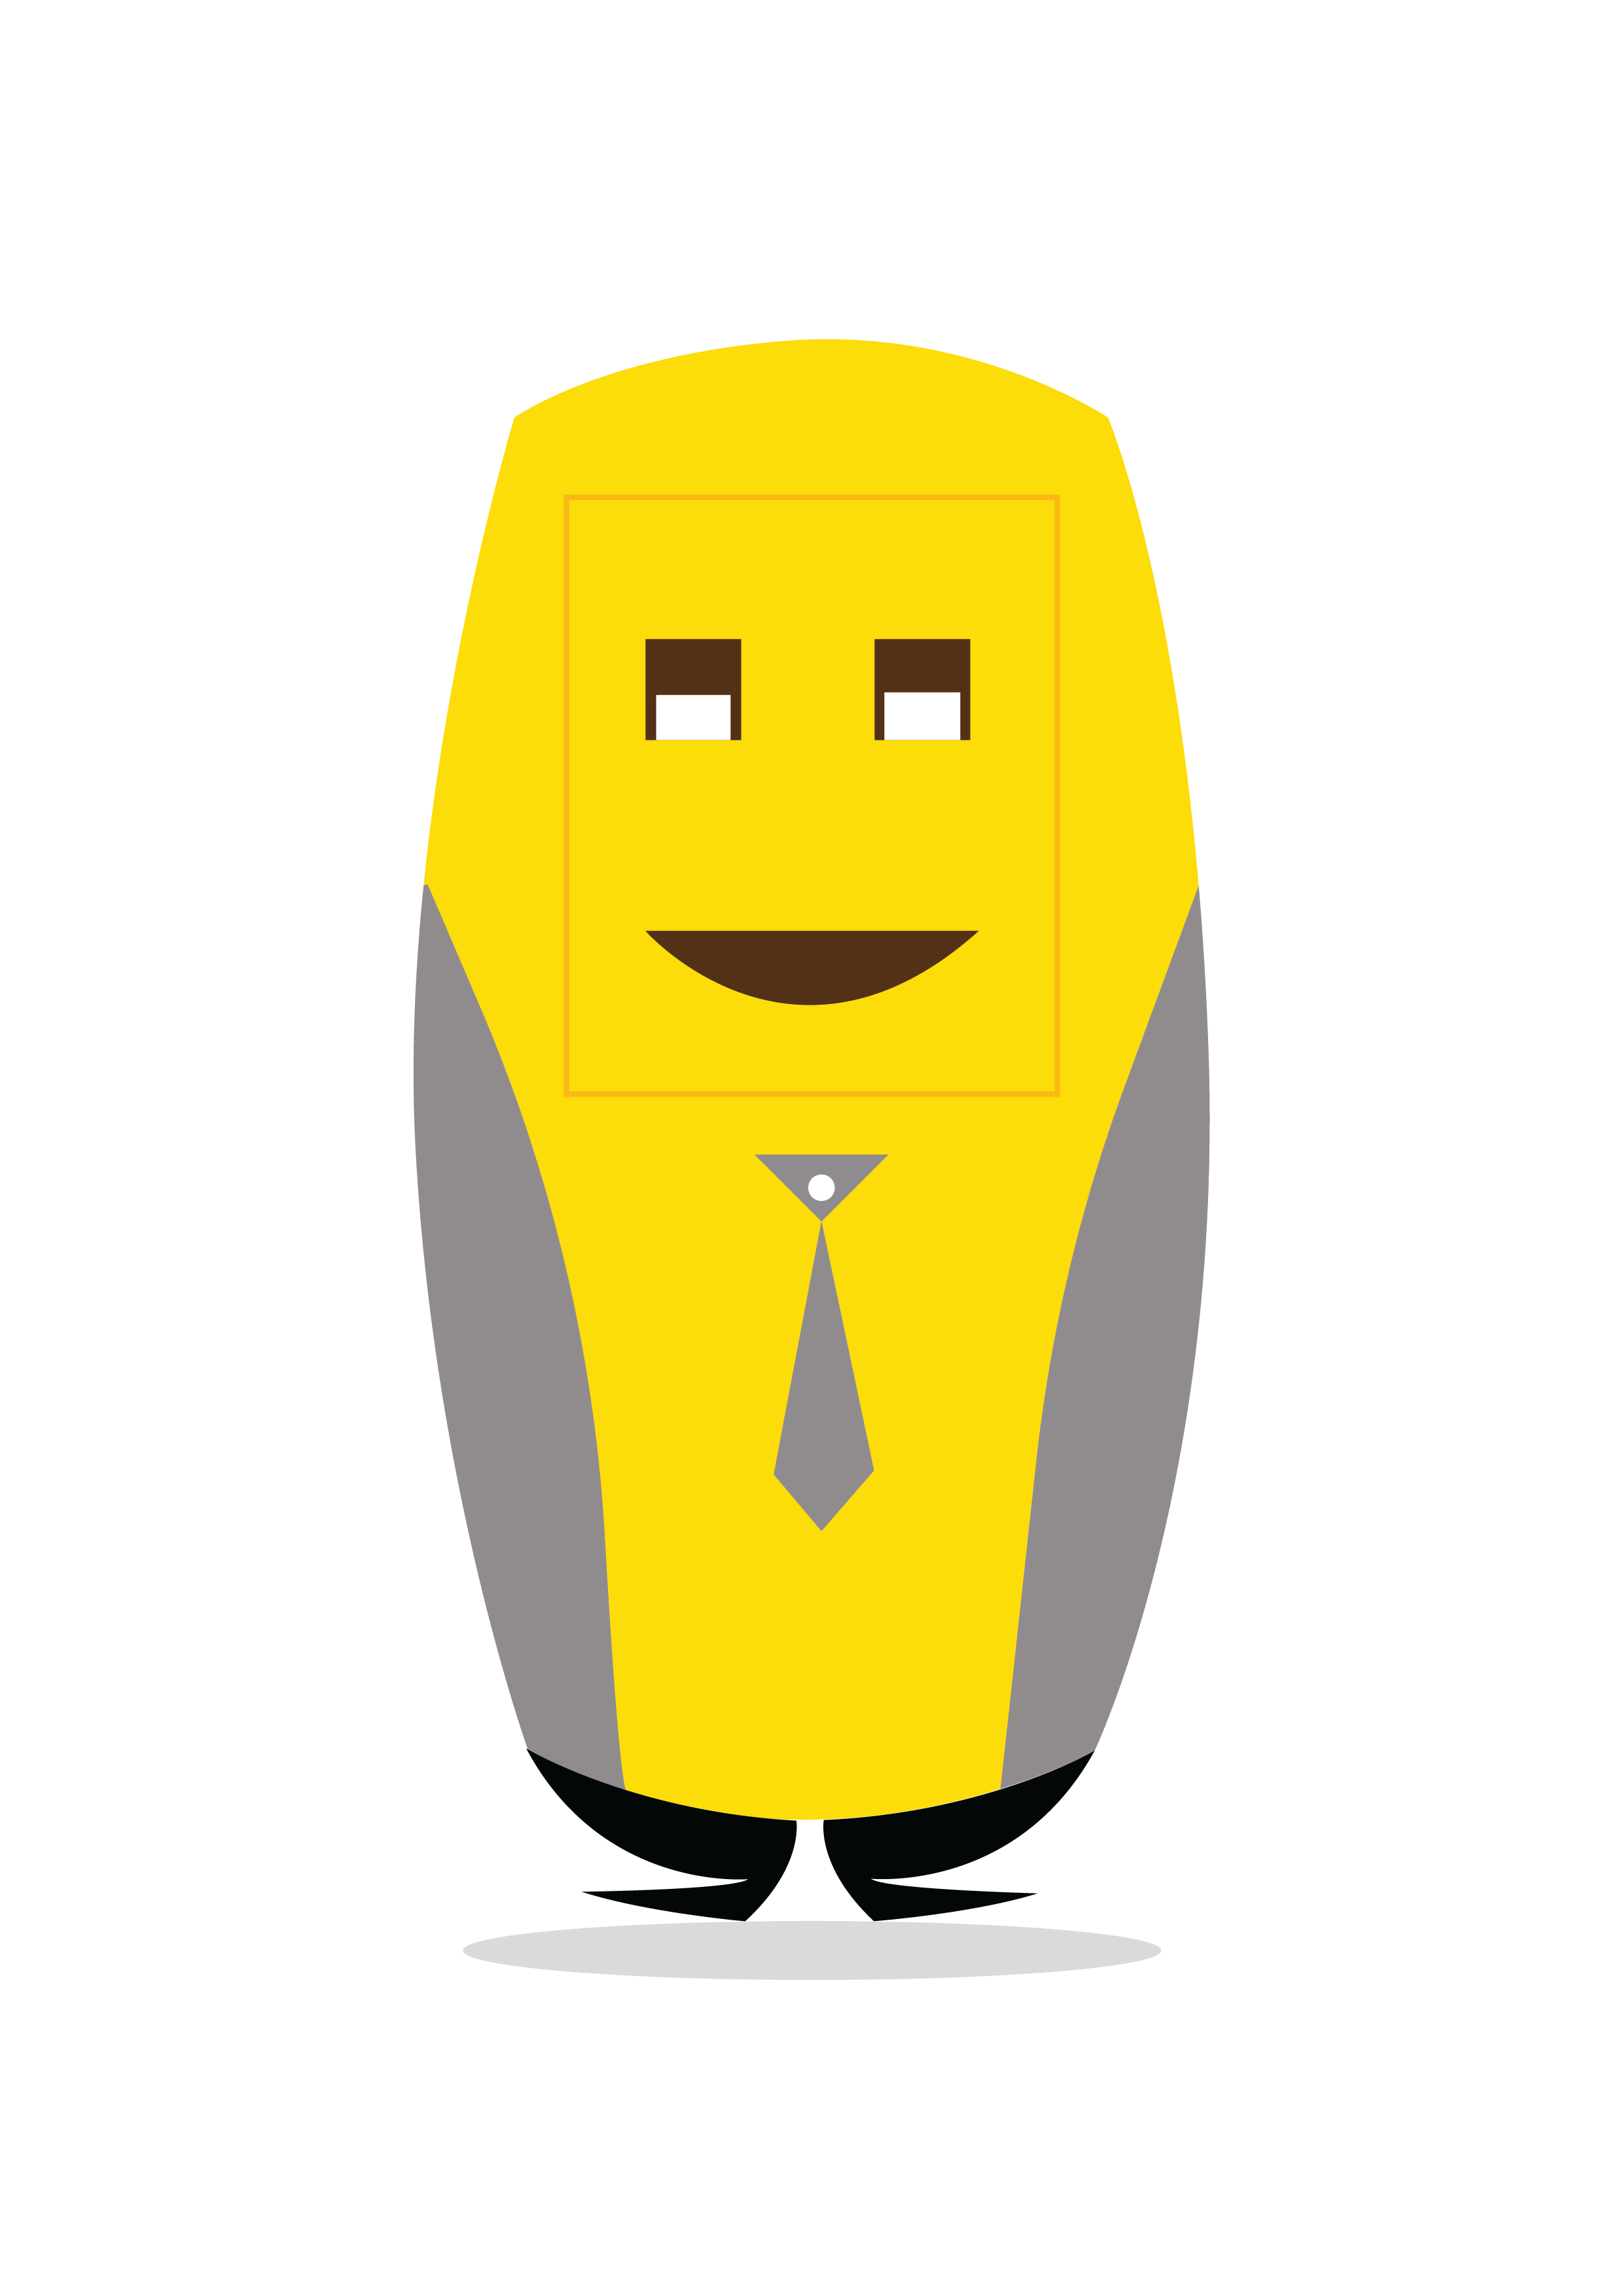 mascot-02